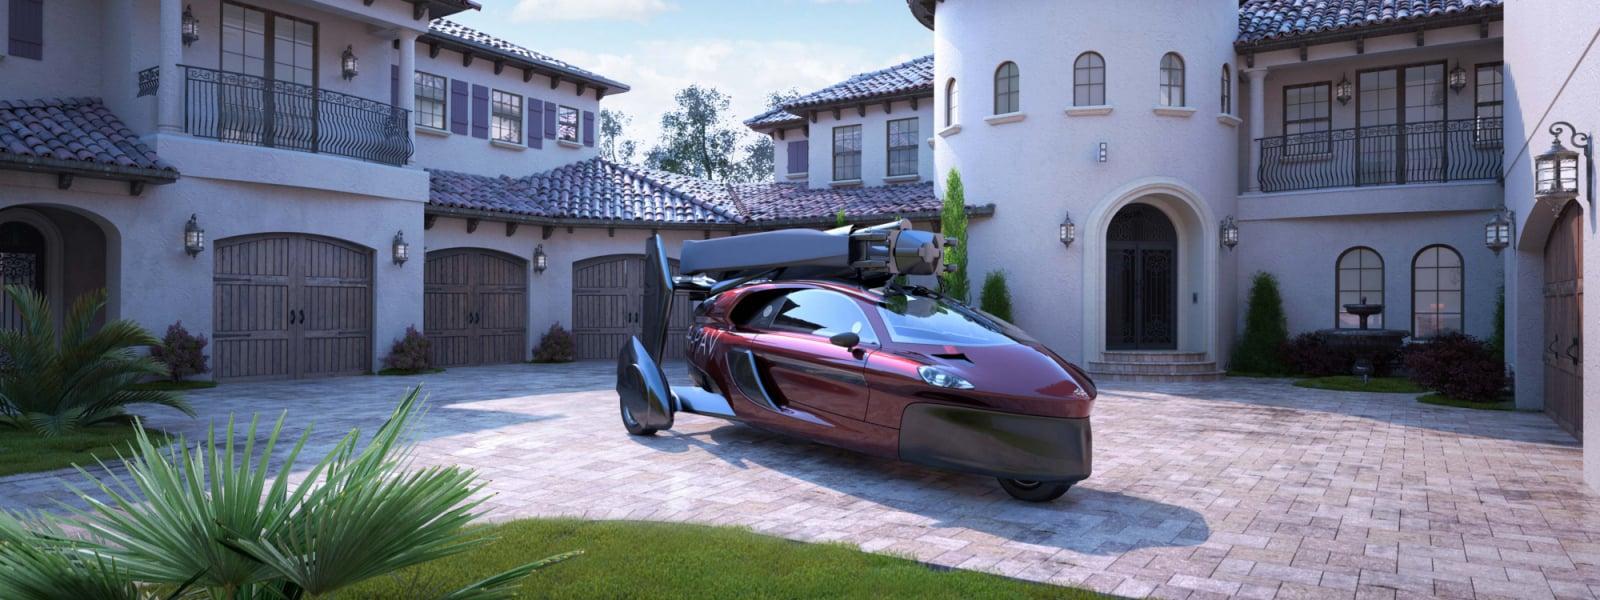 Pal V Flying Car Luxury House